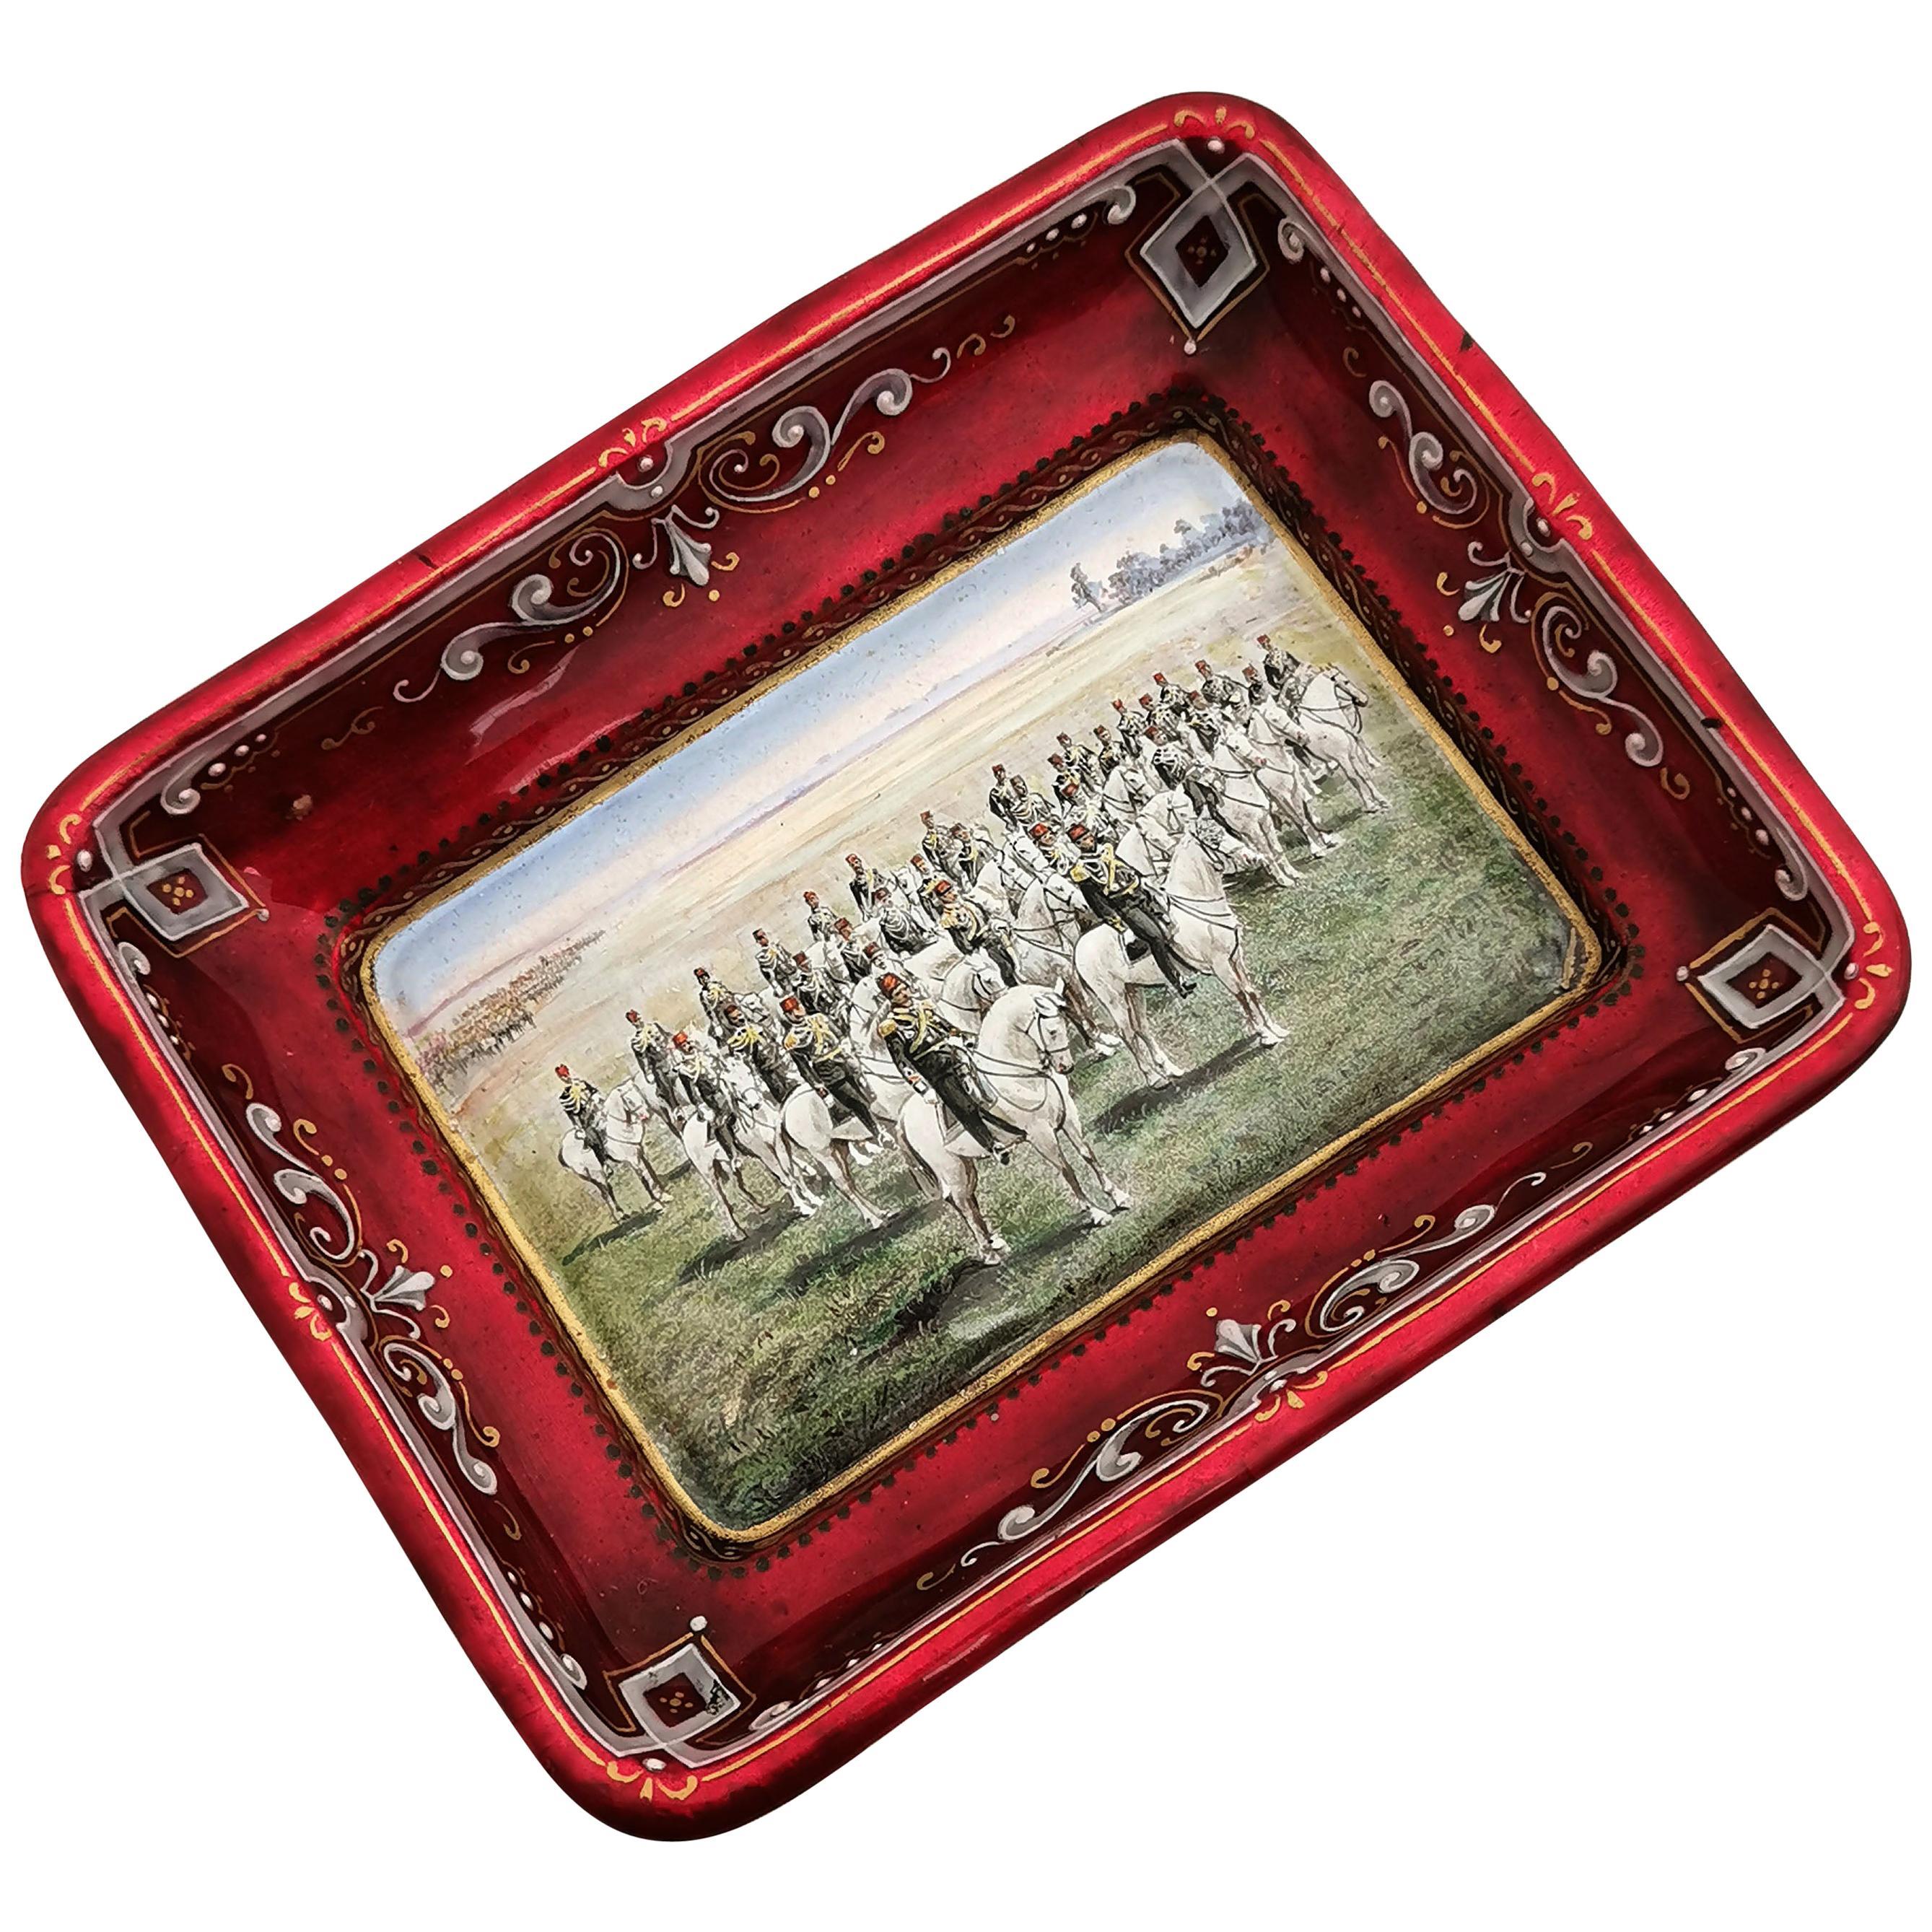 Viennese Enamel Dish / Trinket Pin Tray circa 1880 Turkish Military Parade